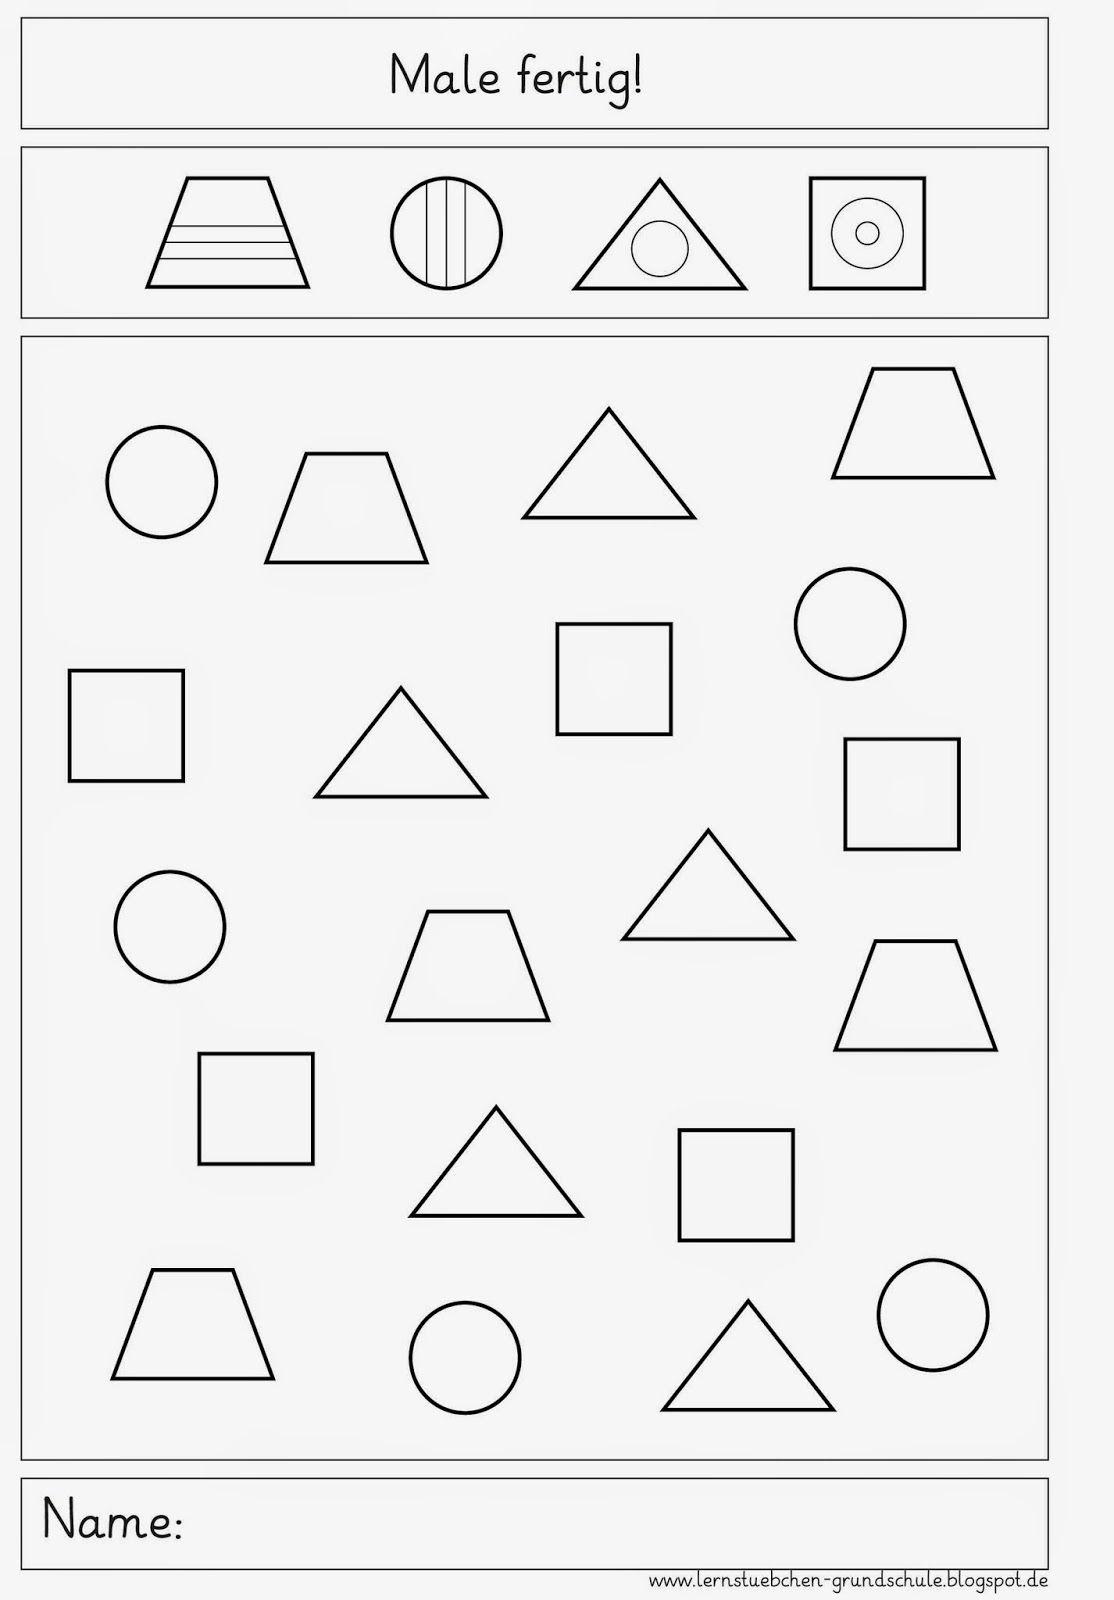 male fertig geometria preschool worksheets kindergarten worksheets und kindergarten portfolio. Black Bedroom Furniture Sets. Home Design Ideas